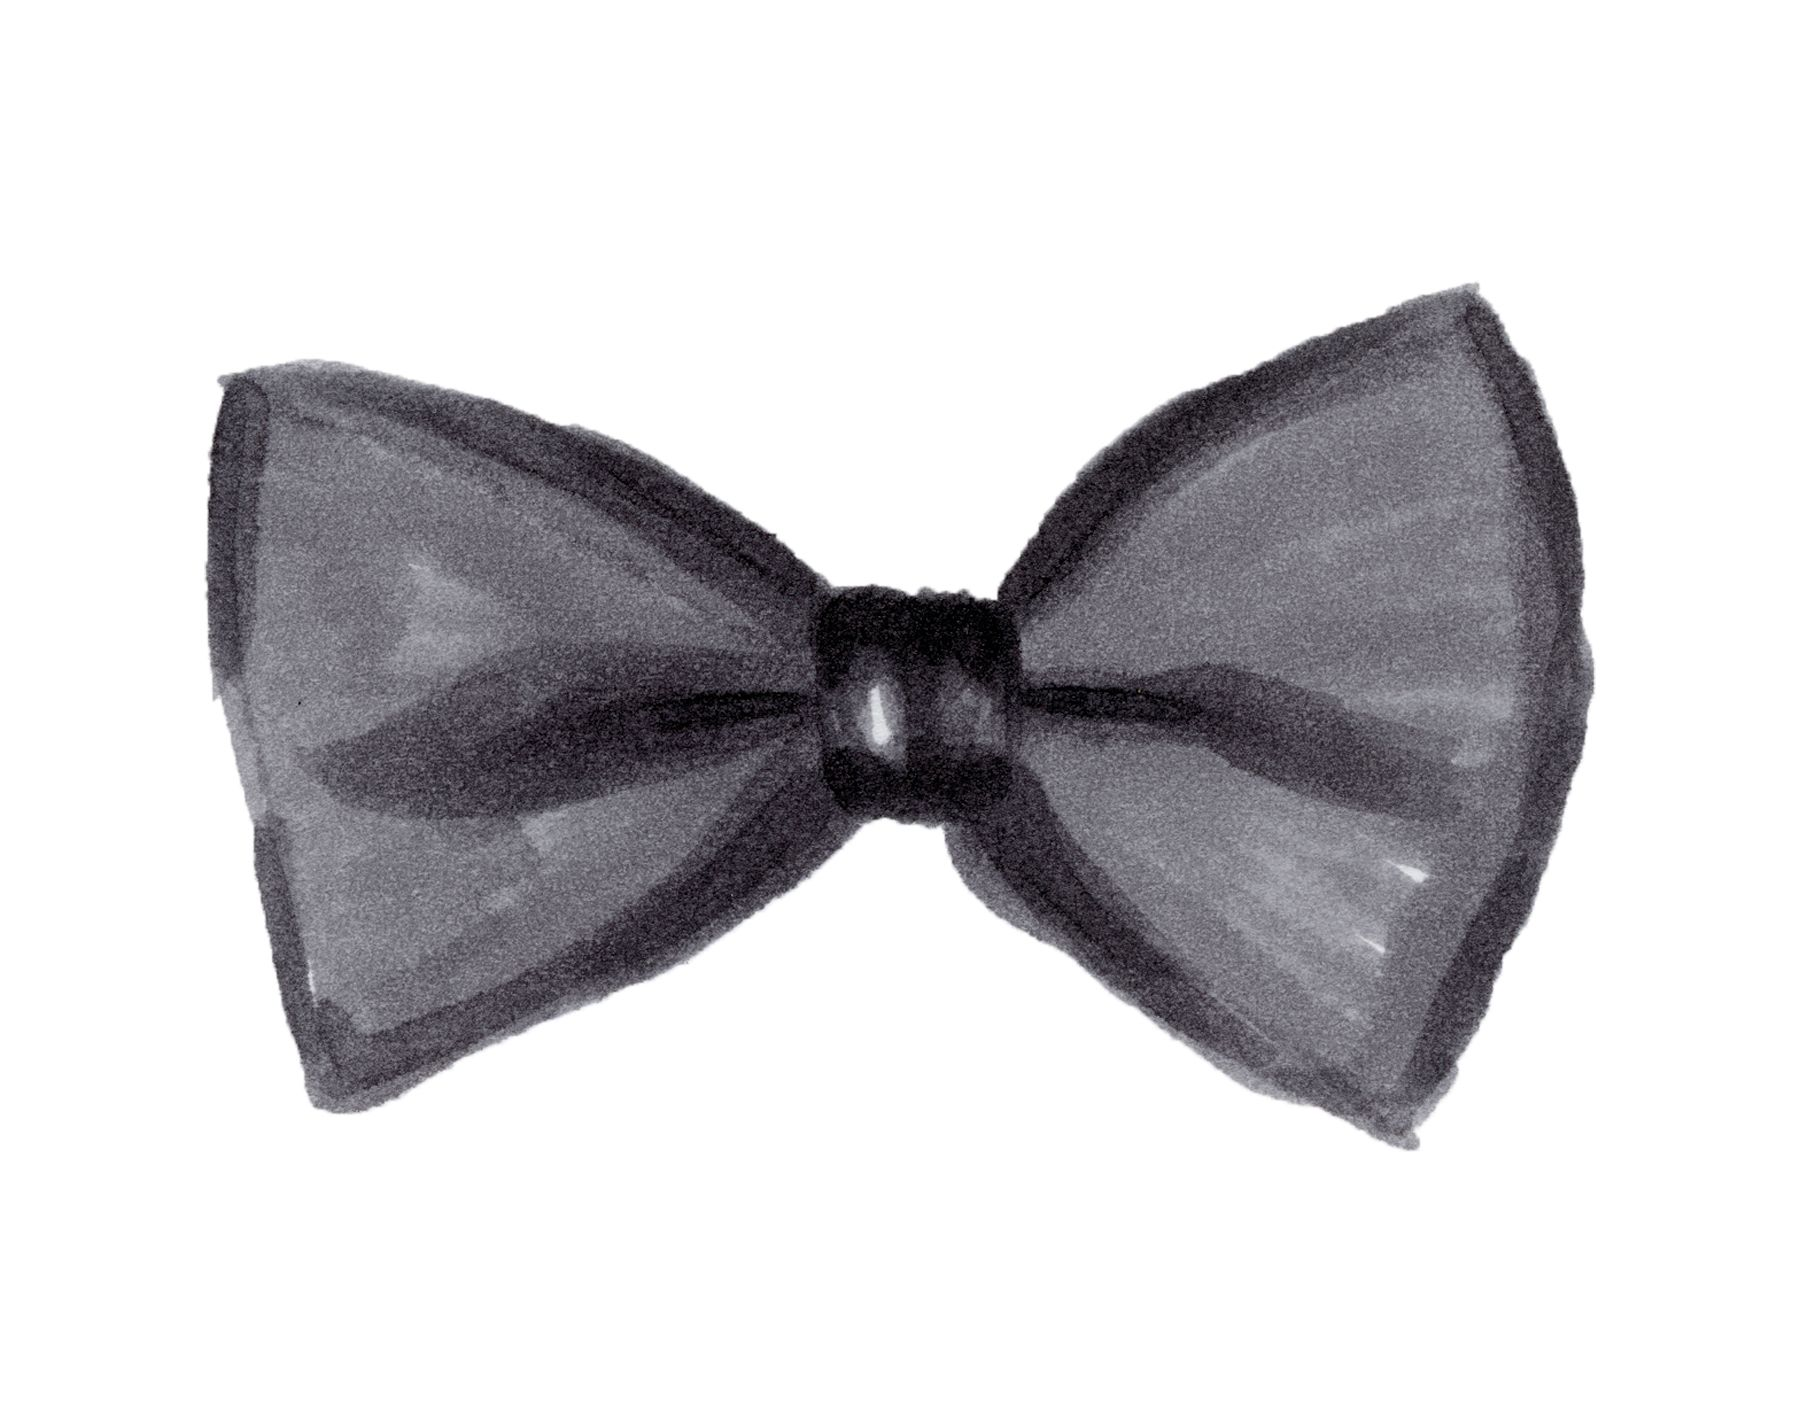 Black Ribbon Bow Tie Black Tie Necktie Shirt Formal Wear Black Tie Transparent Background Png Clipart Black Ribbon Black White Parties Ribbon Png